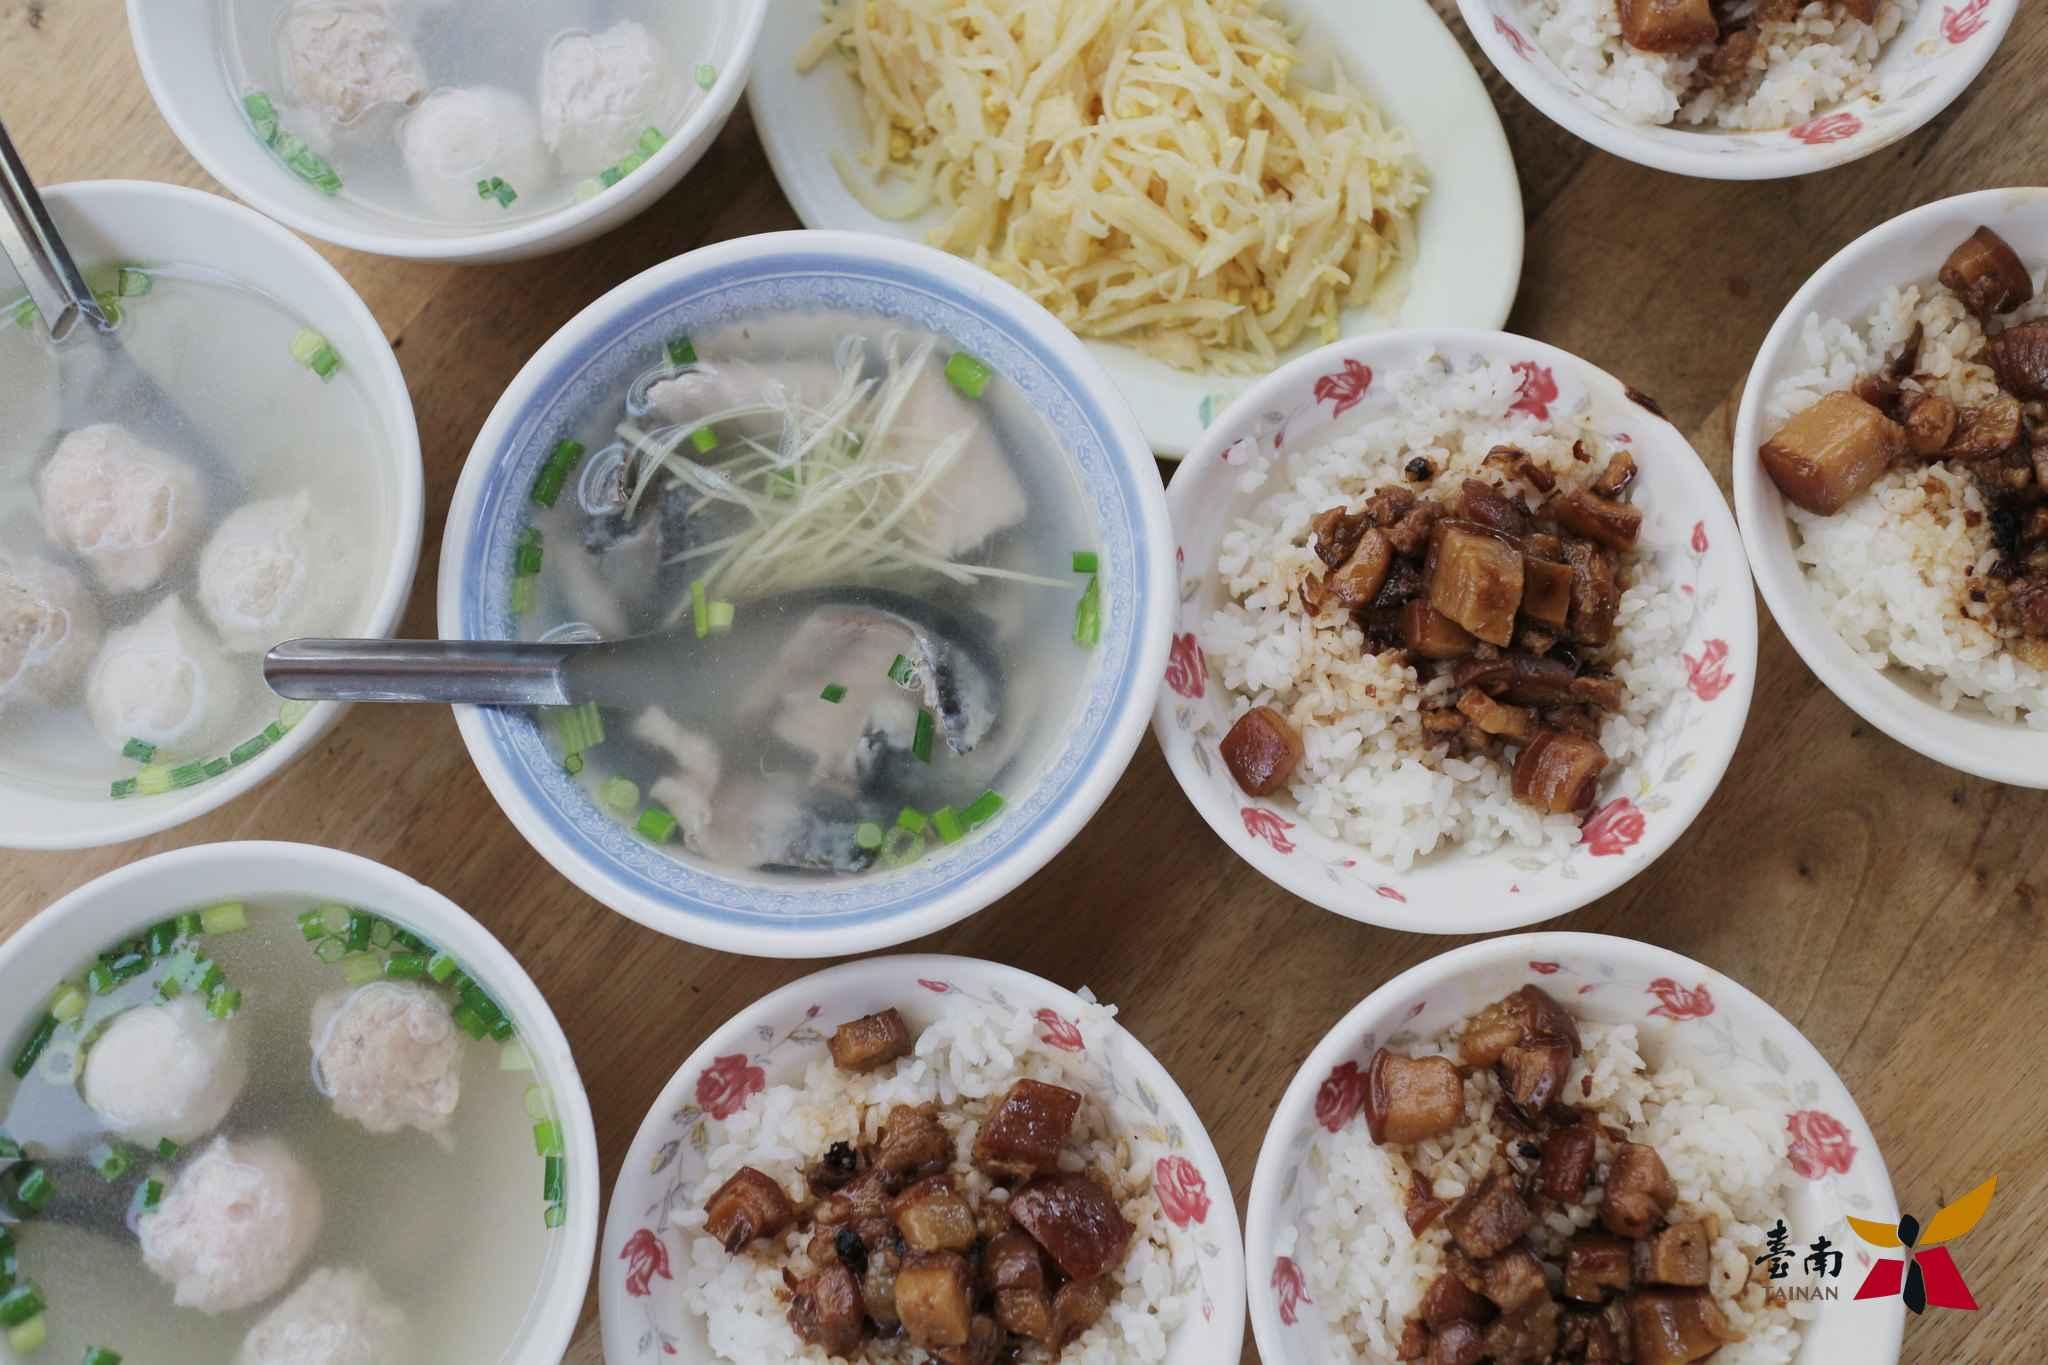 台南 中西區美食- Mytainan - 12